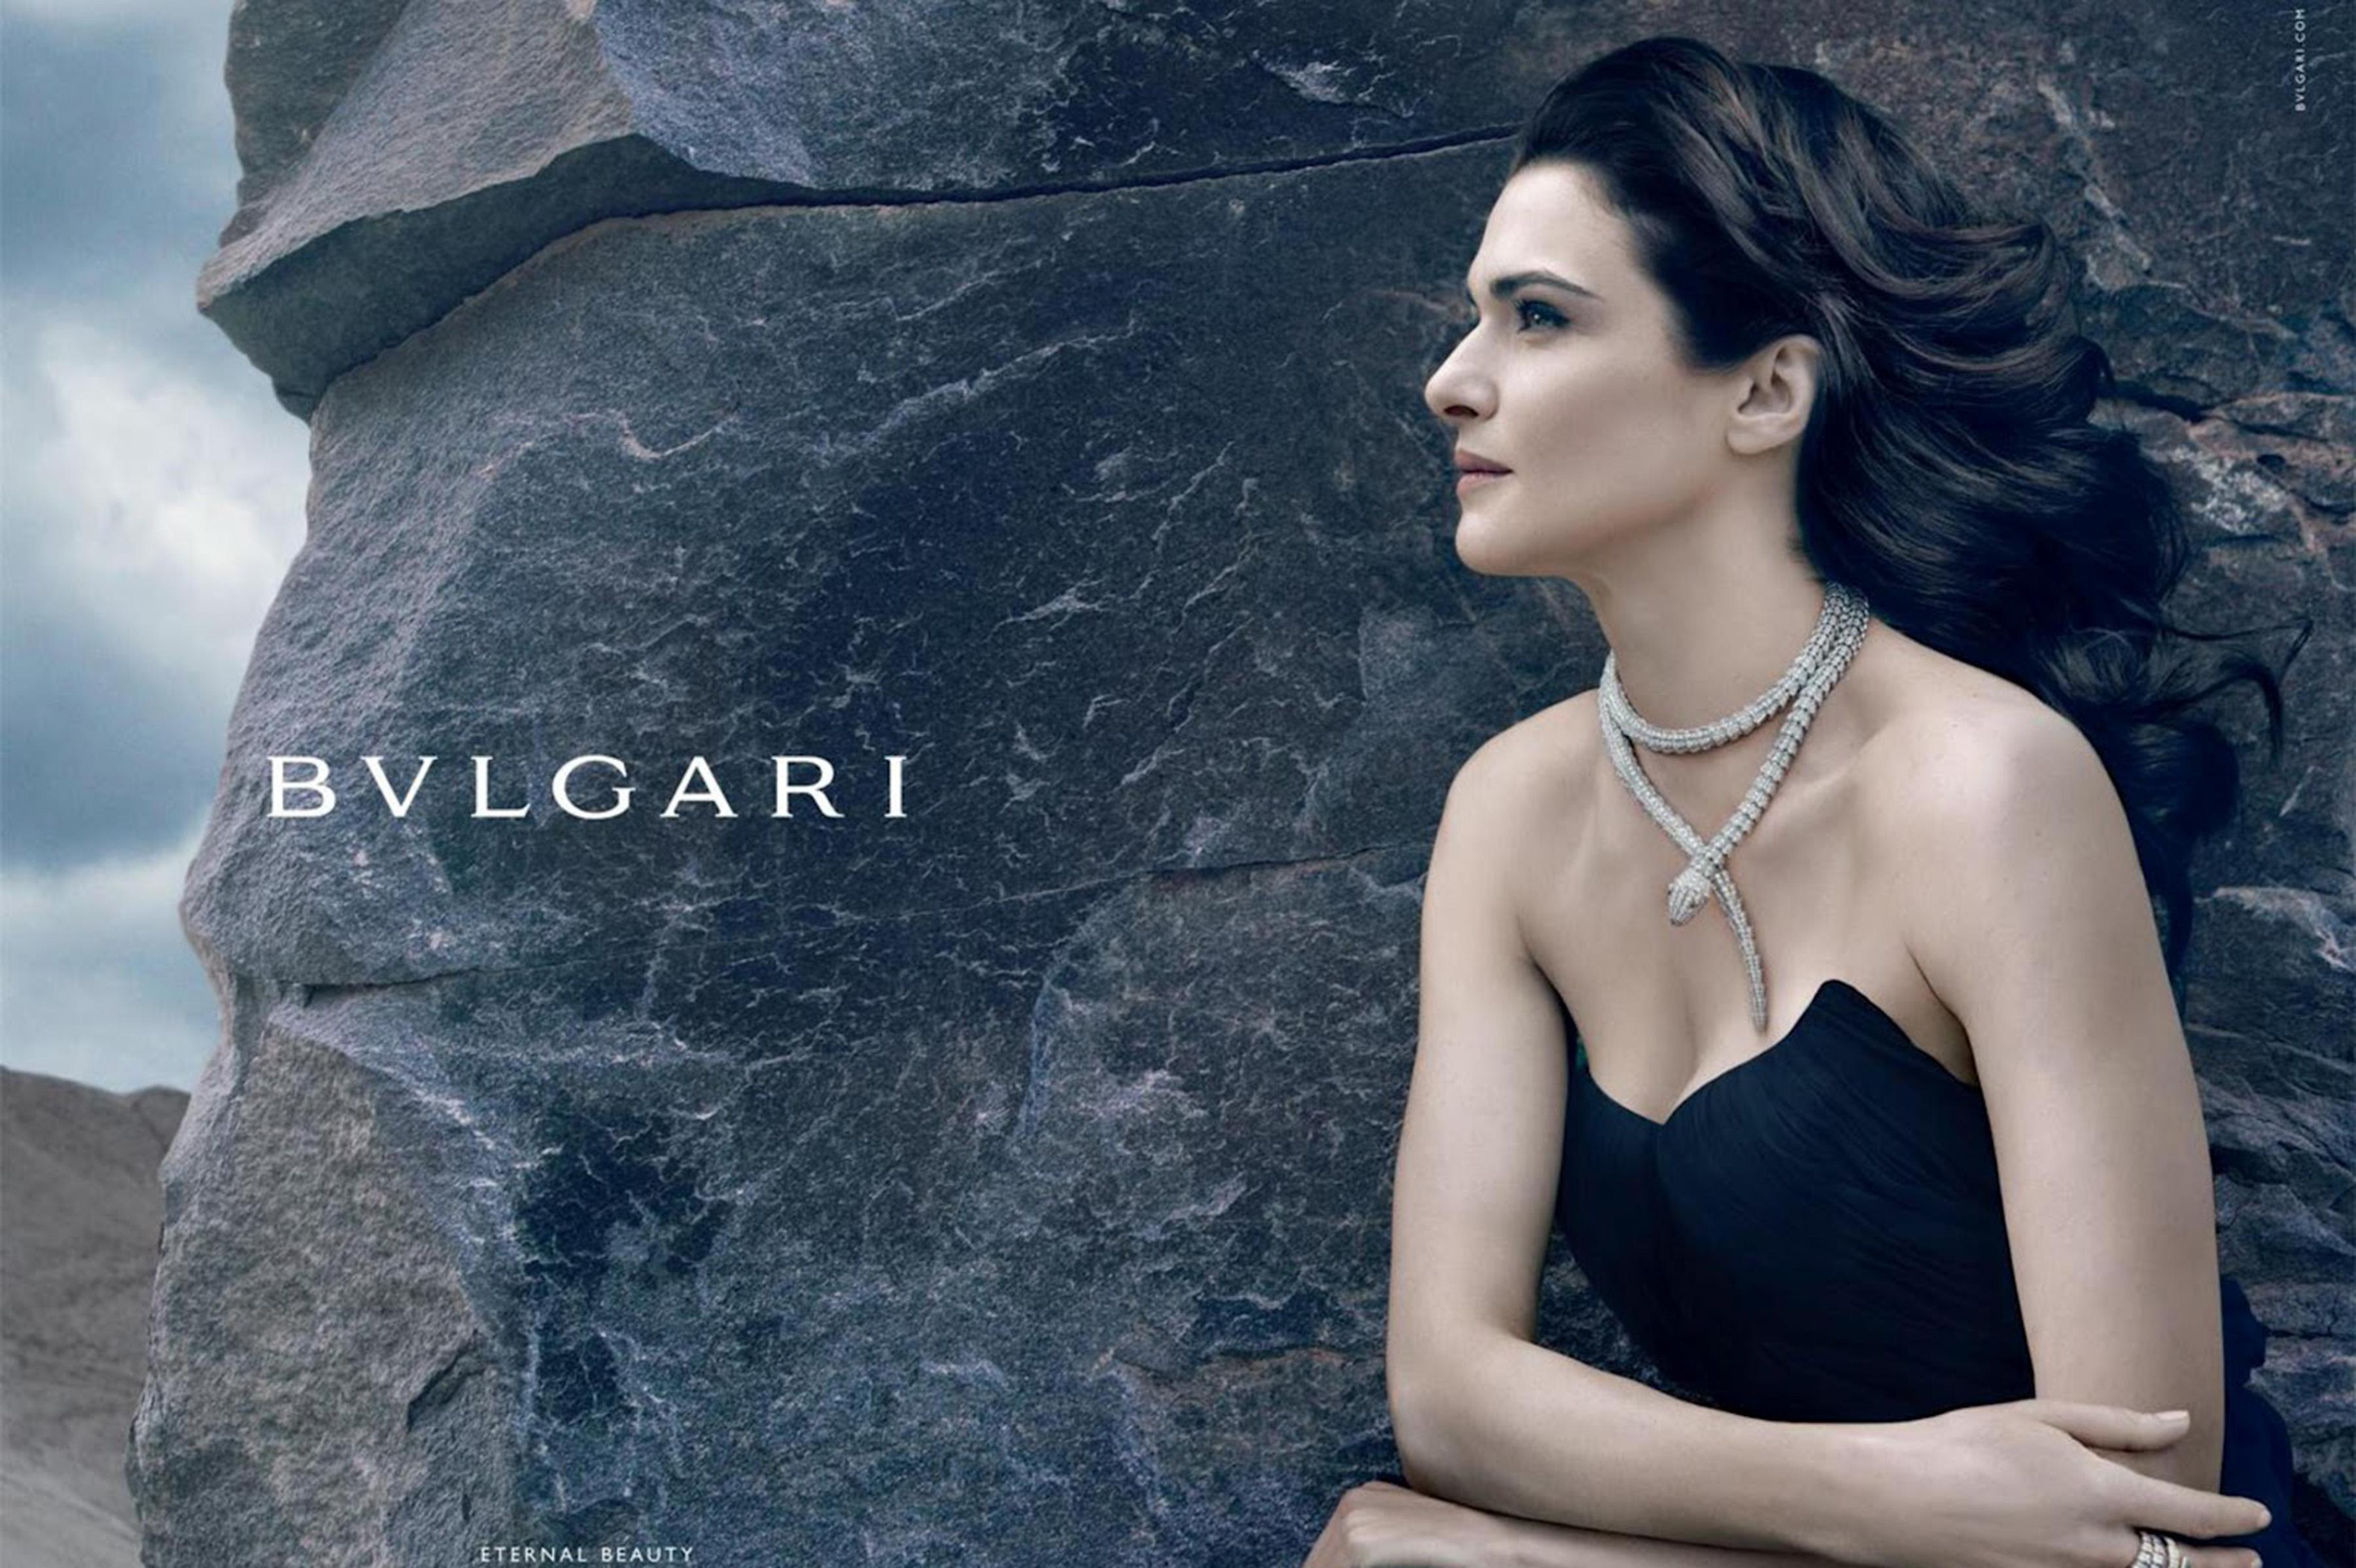 Реклама бренда Bvlgari